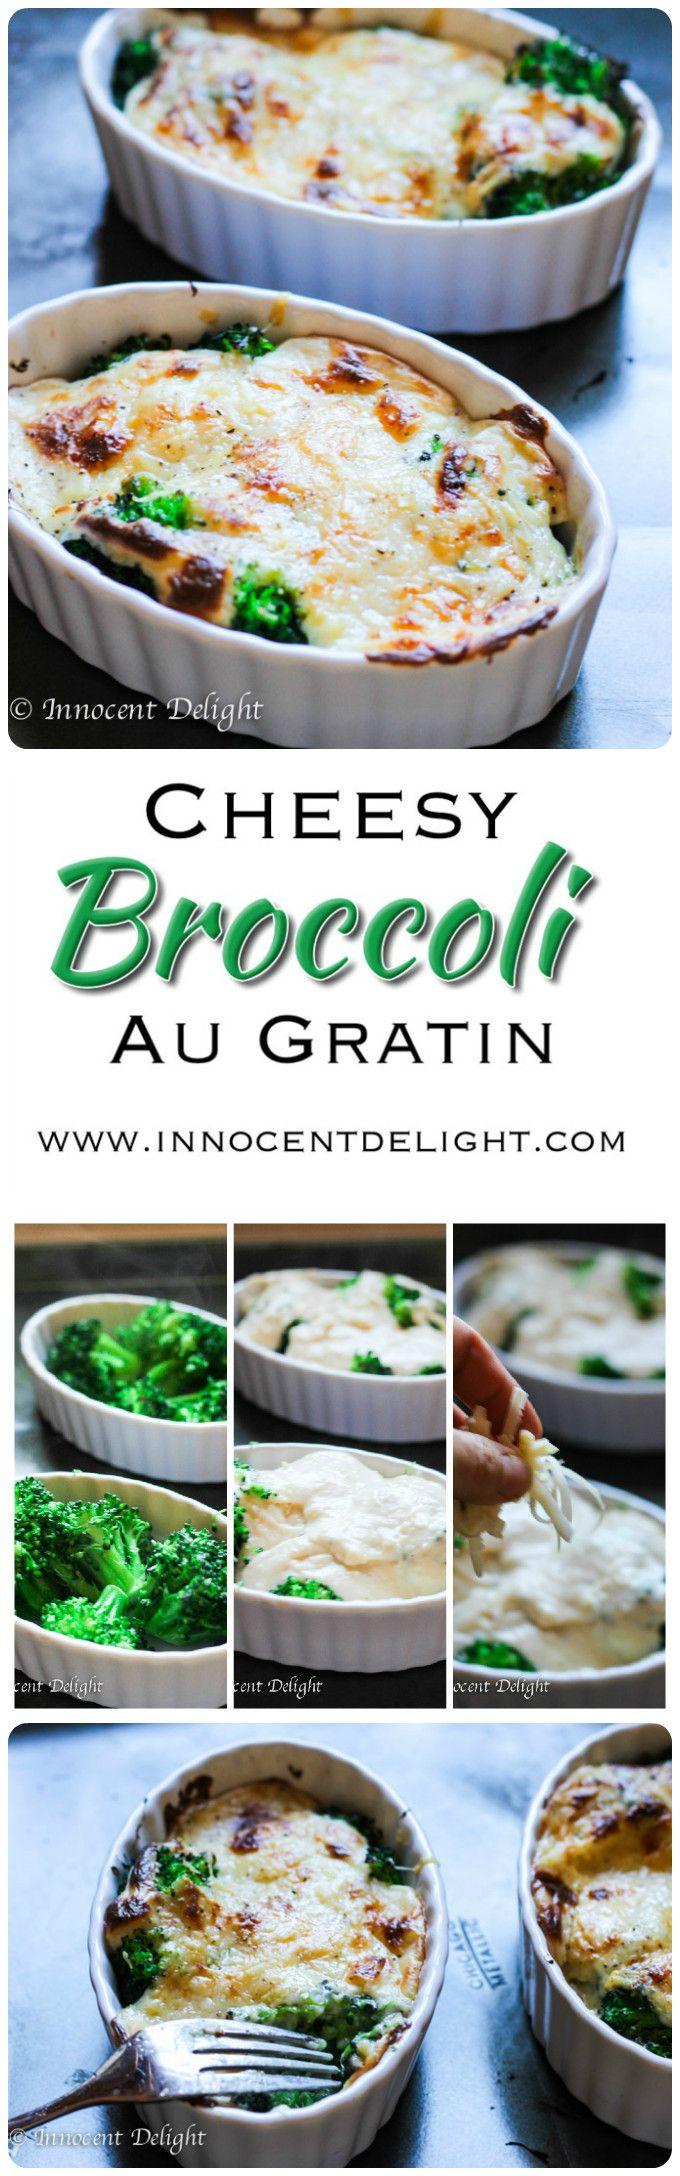 Cheesy Broccoli Au Gratin - the best way to eat broccoli.